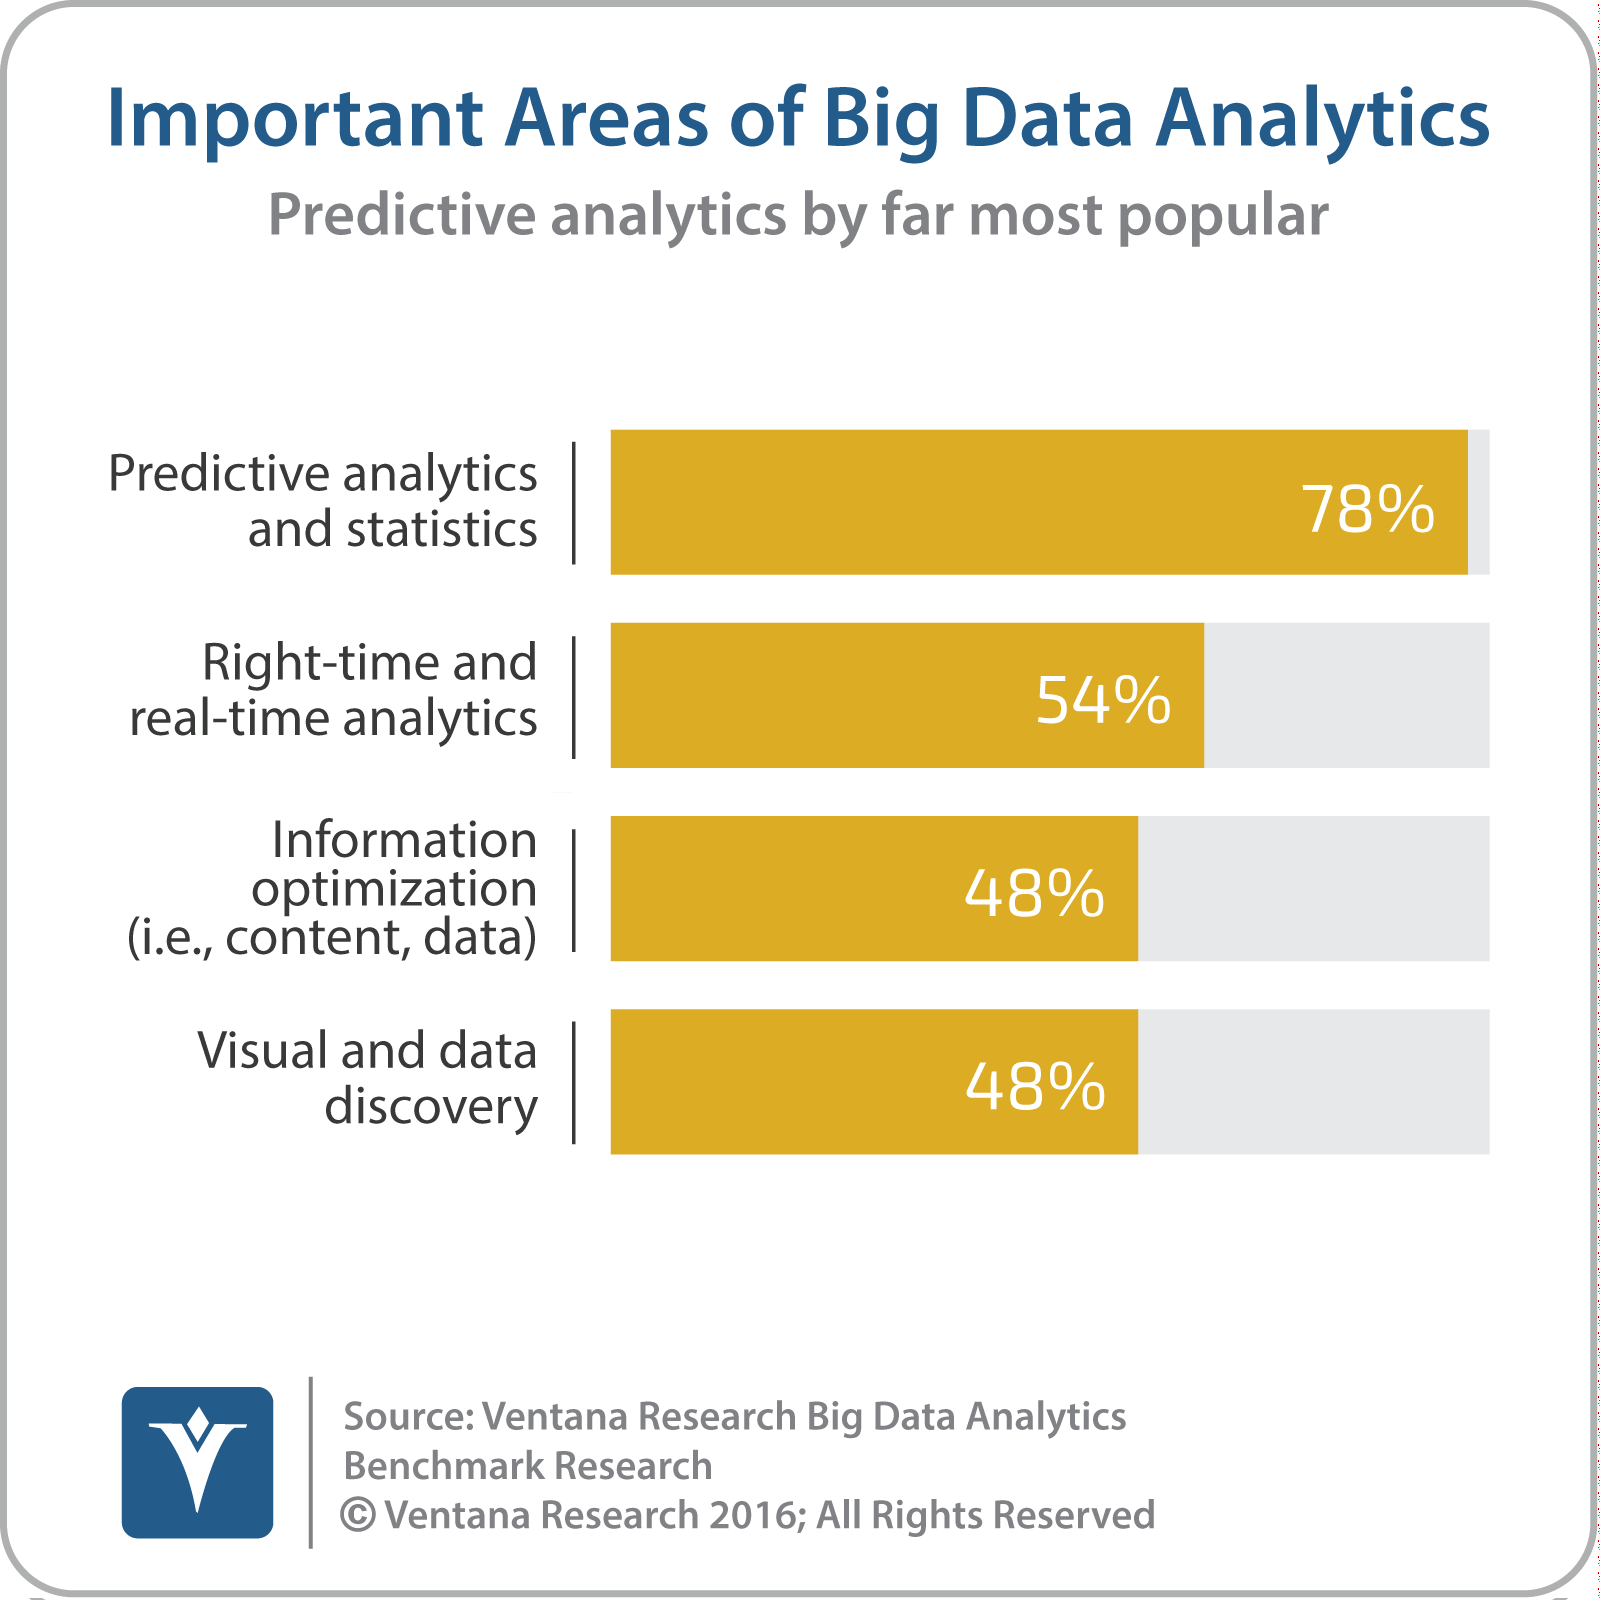 vr_Big_Data_Analytics_19_important_areas_of_big_data_analytics_updated-2.png